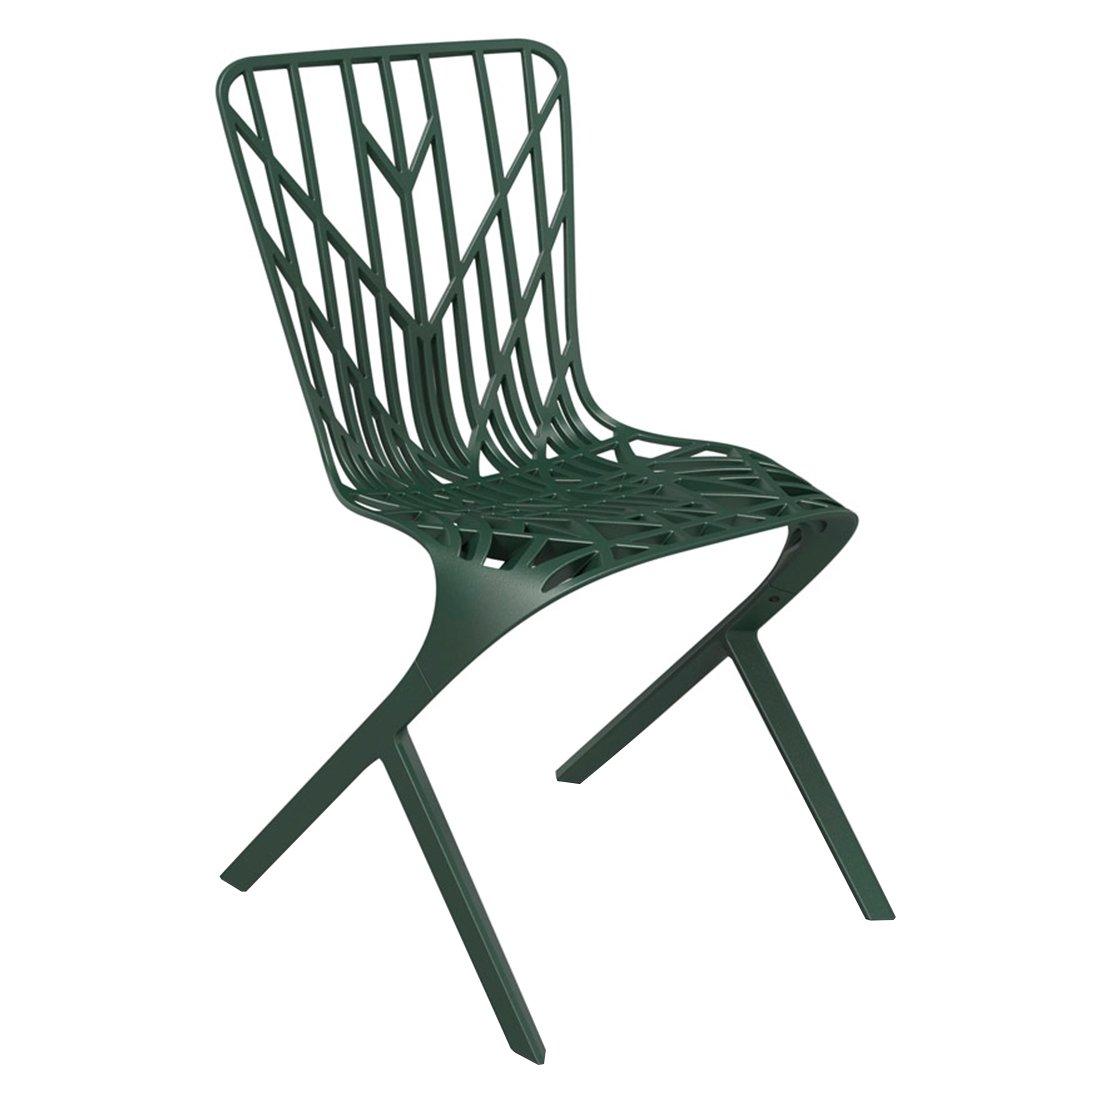 Knoll Washington Skeleton Chair - Groen